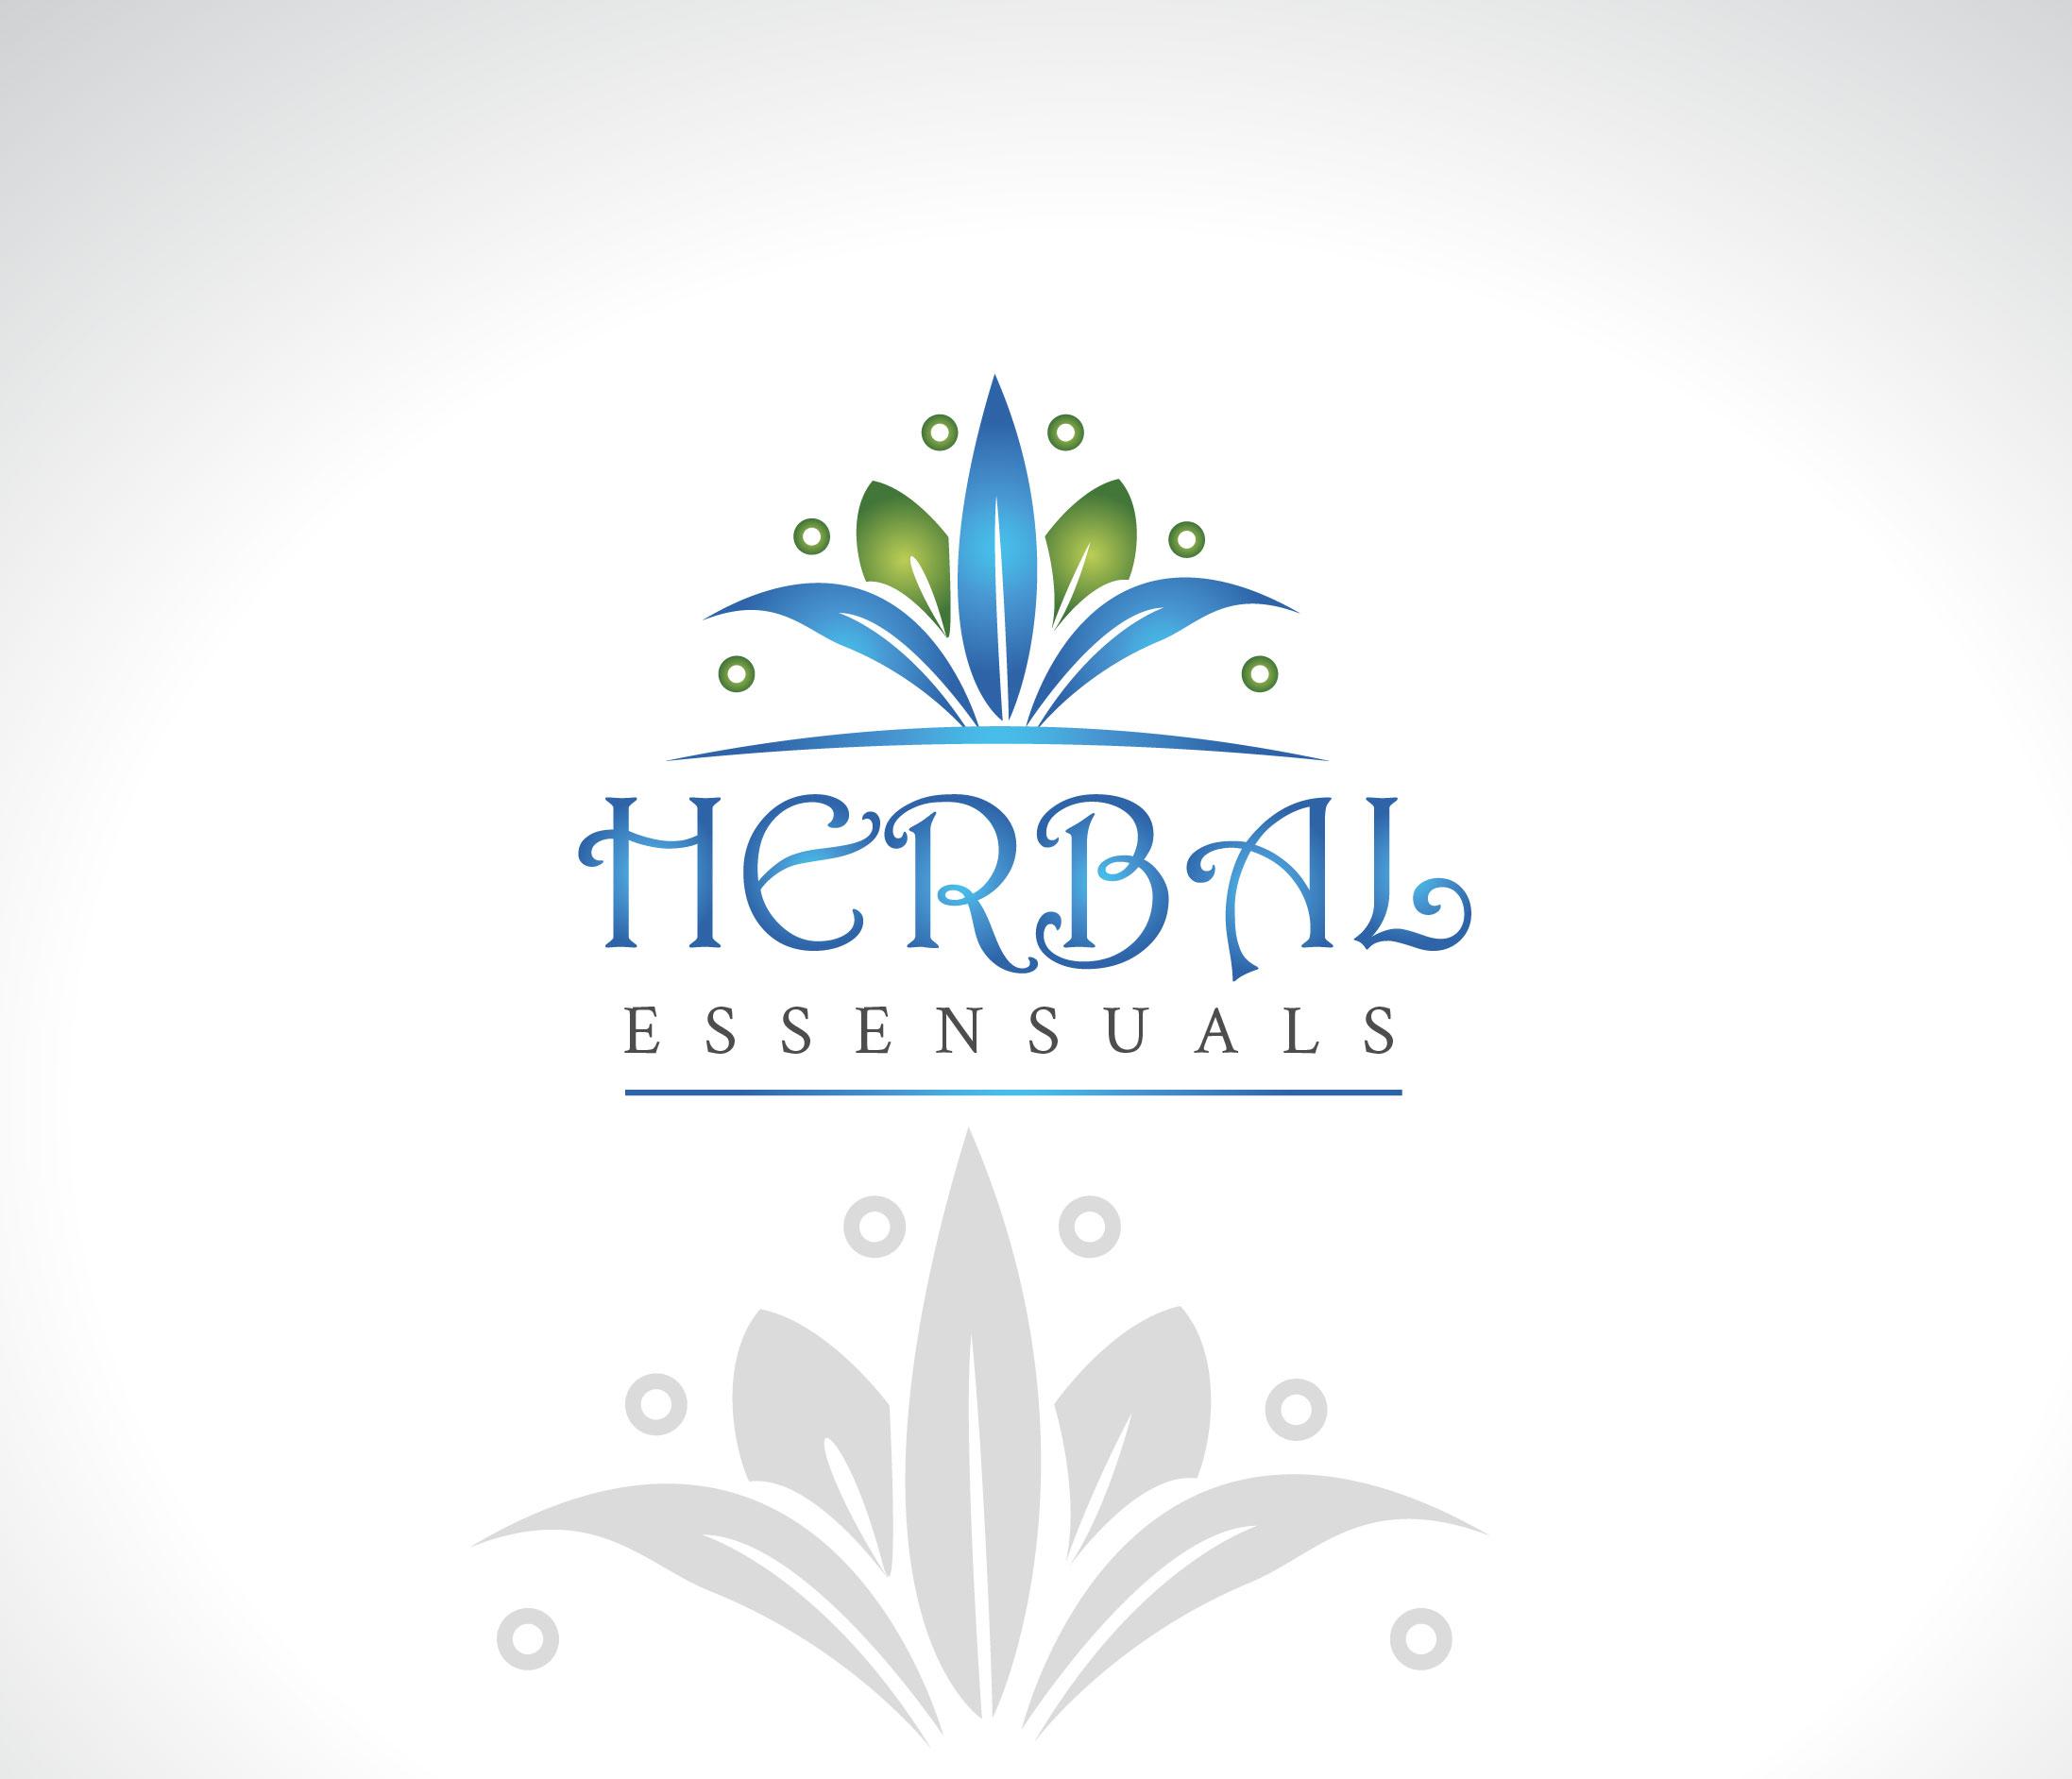 Logo Design by Darina Dimitrova - Entry No. 81 in the Logo Design Contest Captivating Logo Design for Herbal Essensuals.